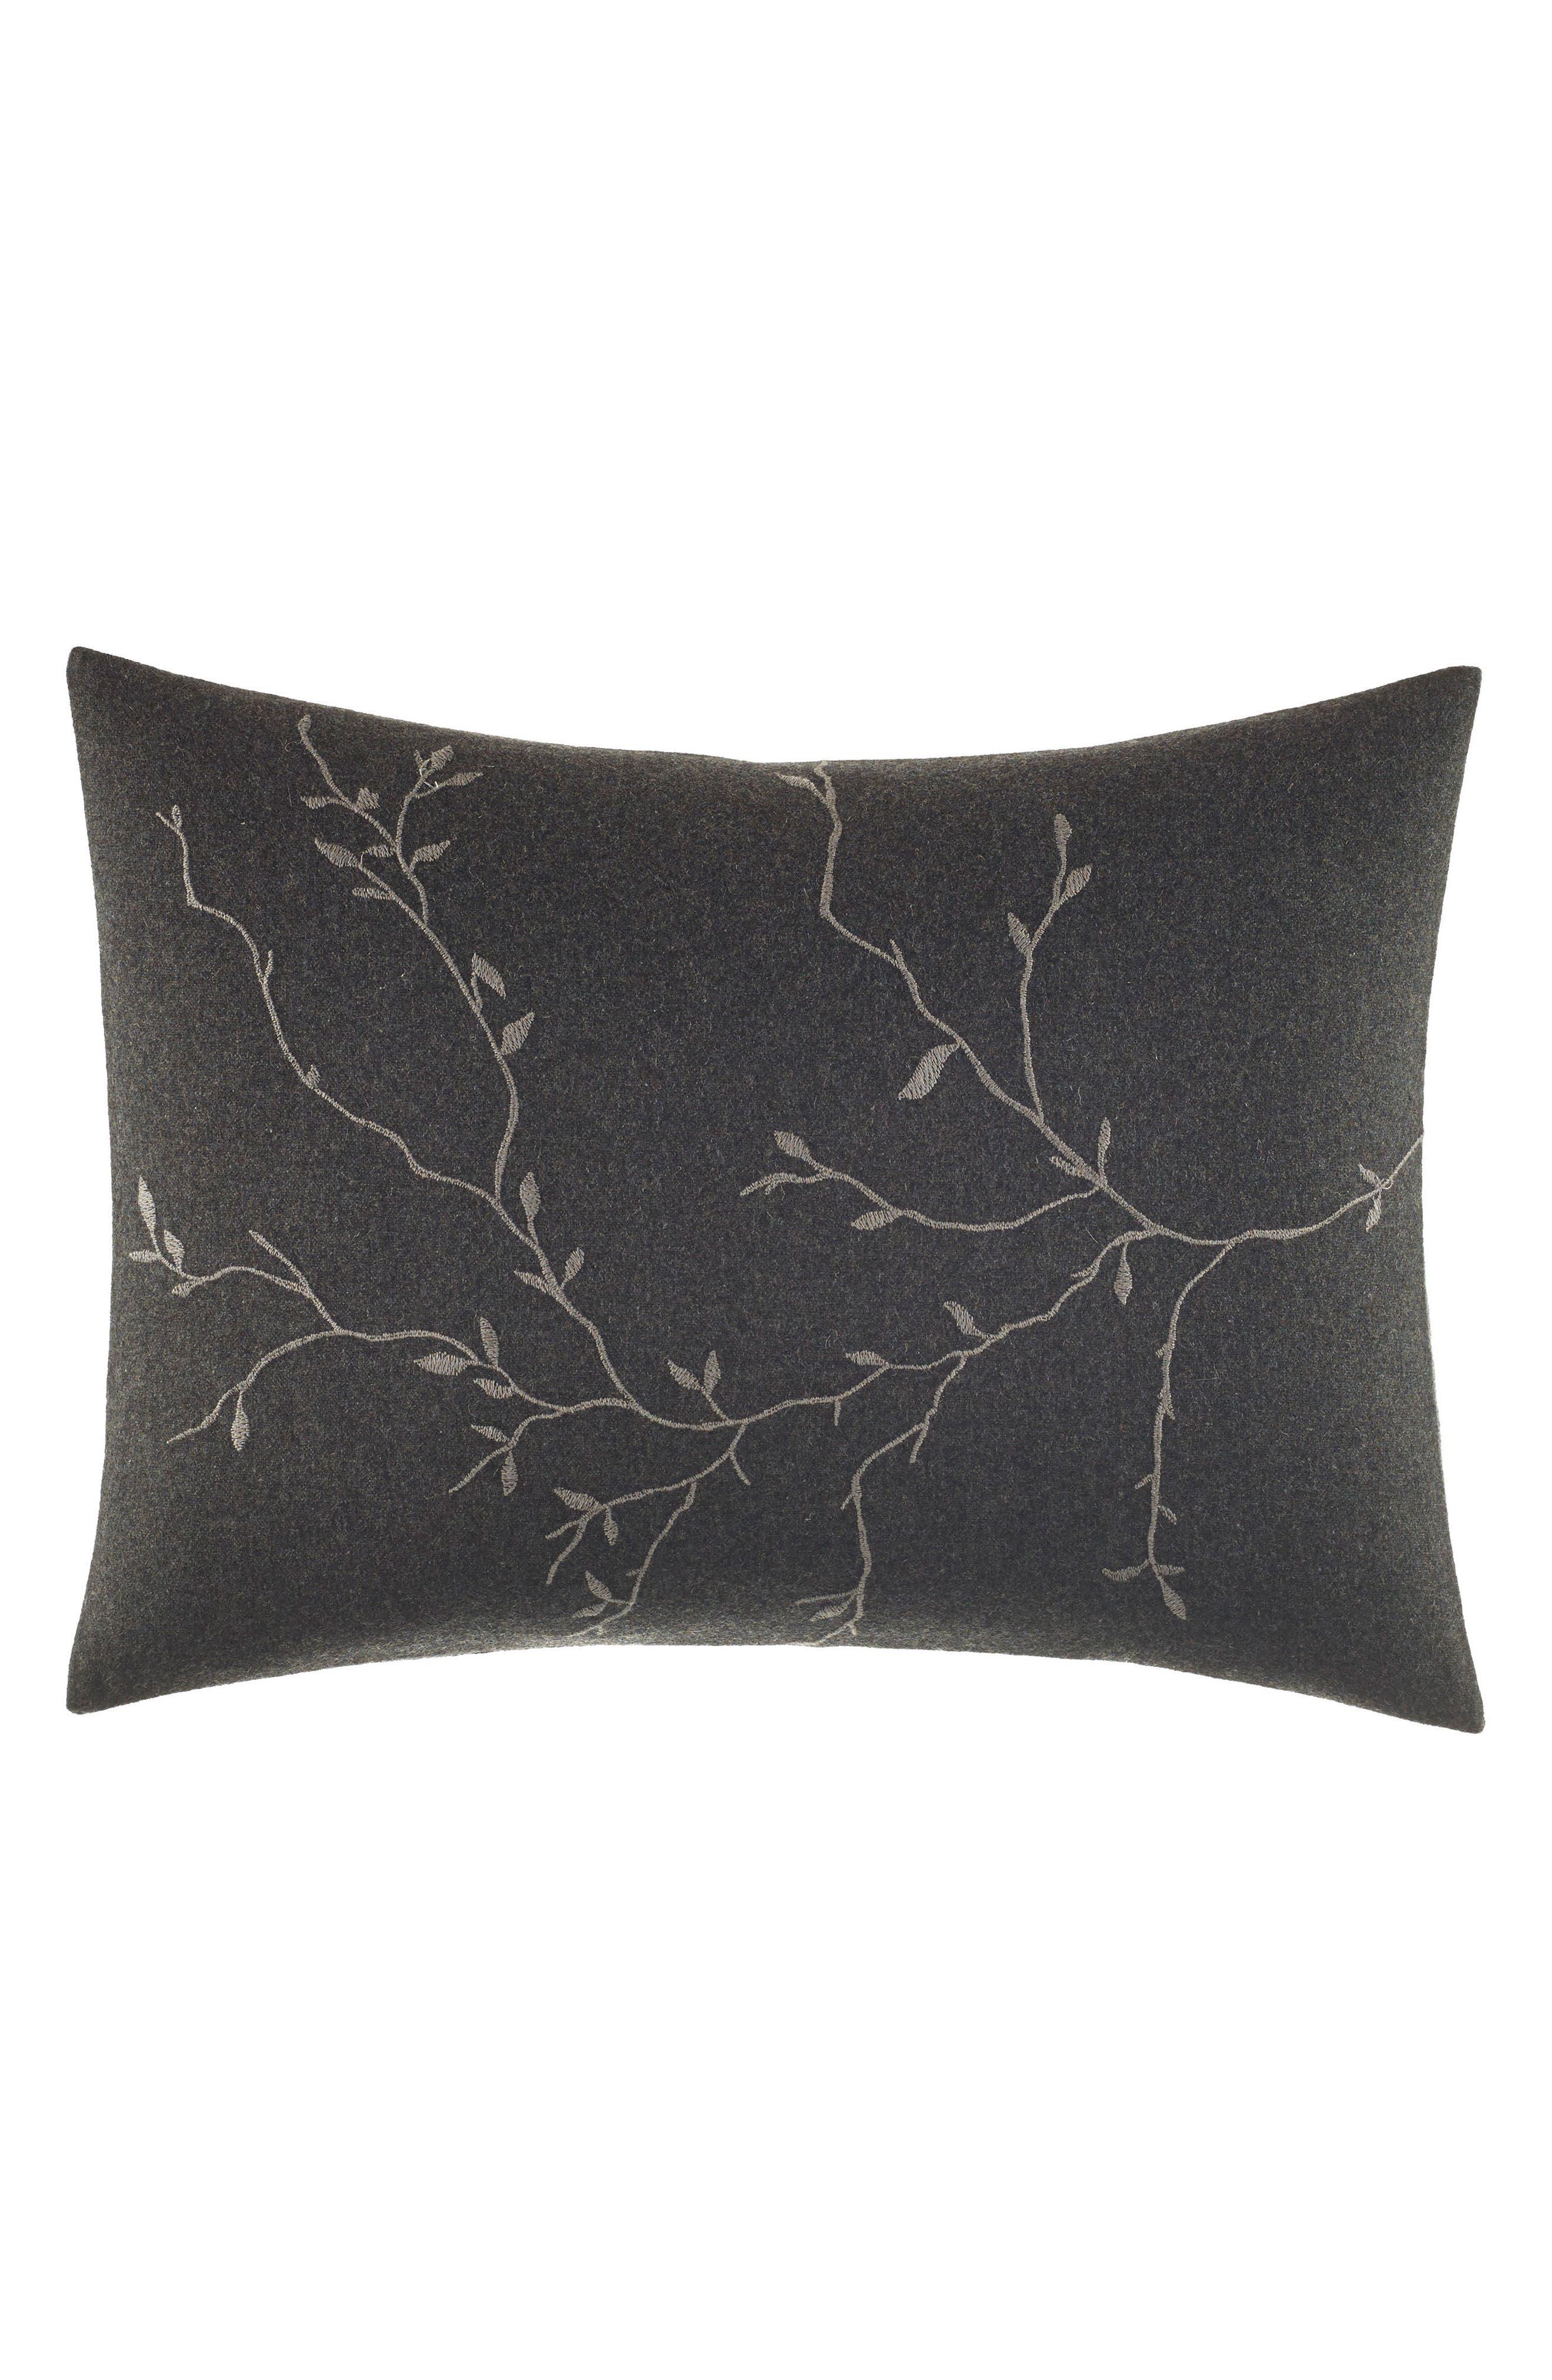 Charcoal Floral Vine Accent Pillow,                         Main,                         color, Dark Gray